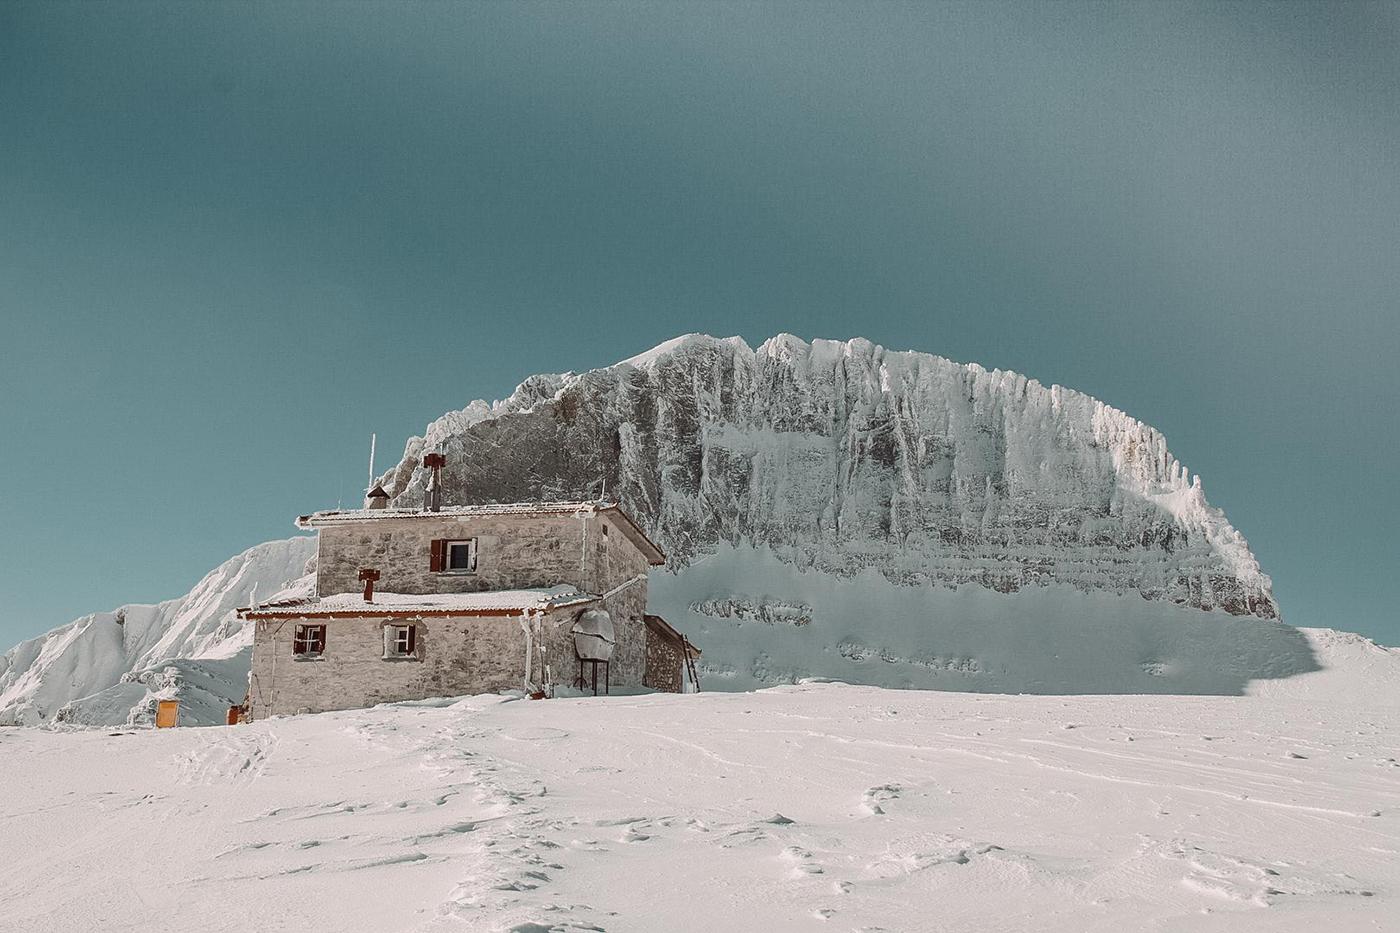 my-wanderlust-notes-meteore-weekend-lungo-attraverso-la-grecia-nascosta-rifugio